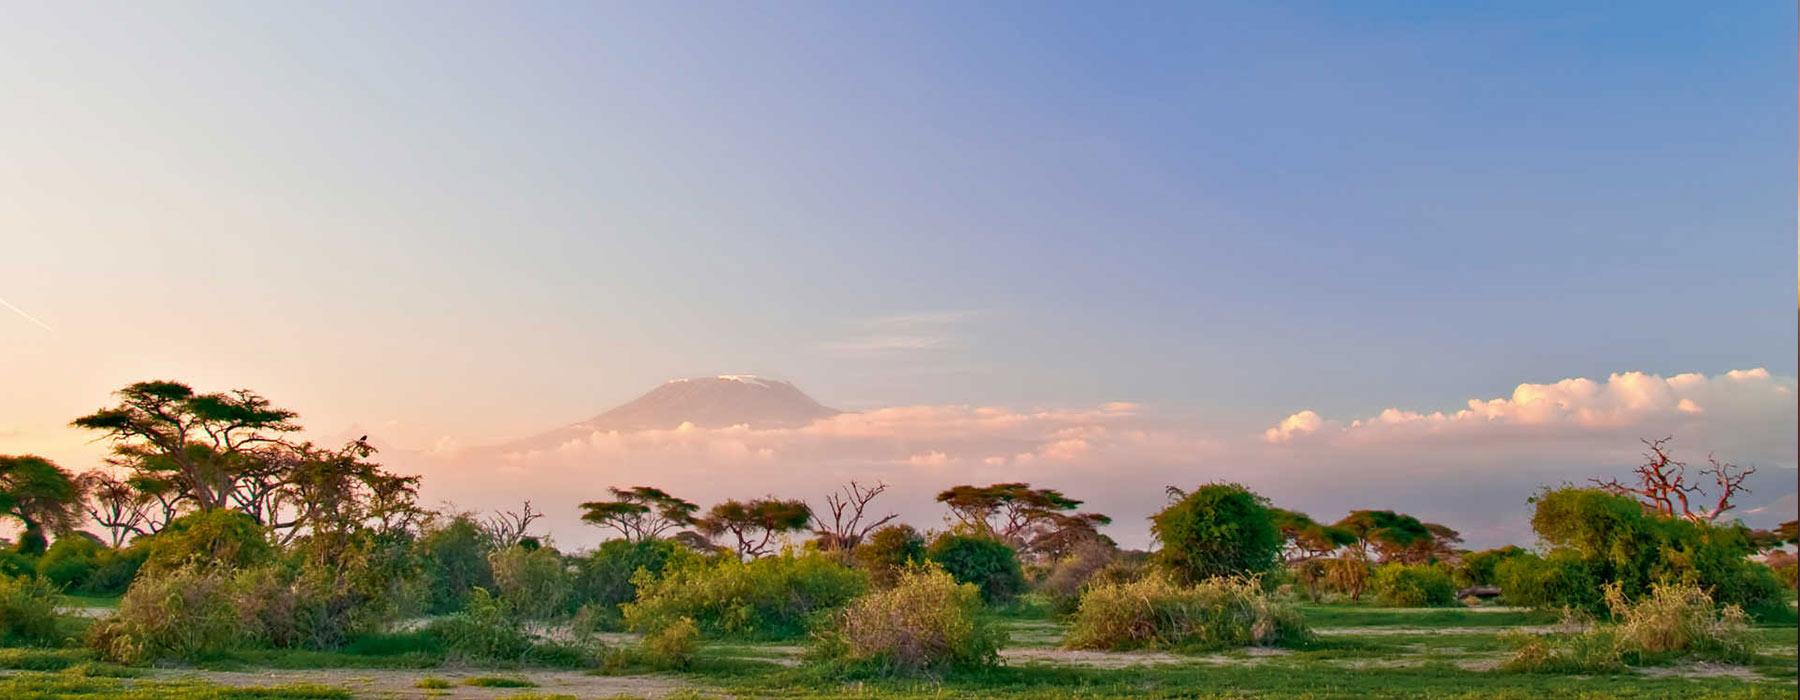 Electronic Gadgets On Kilimanjaro